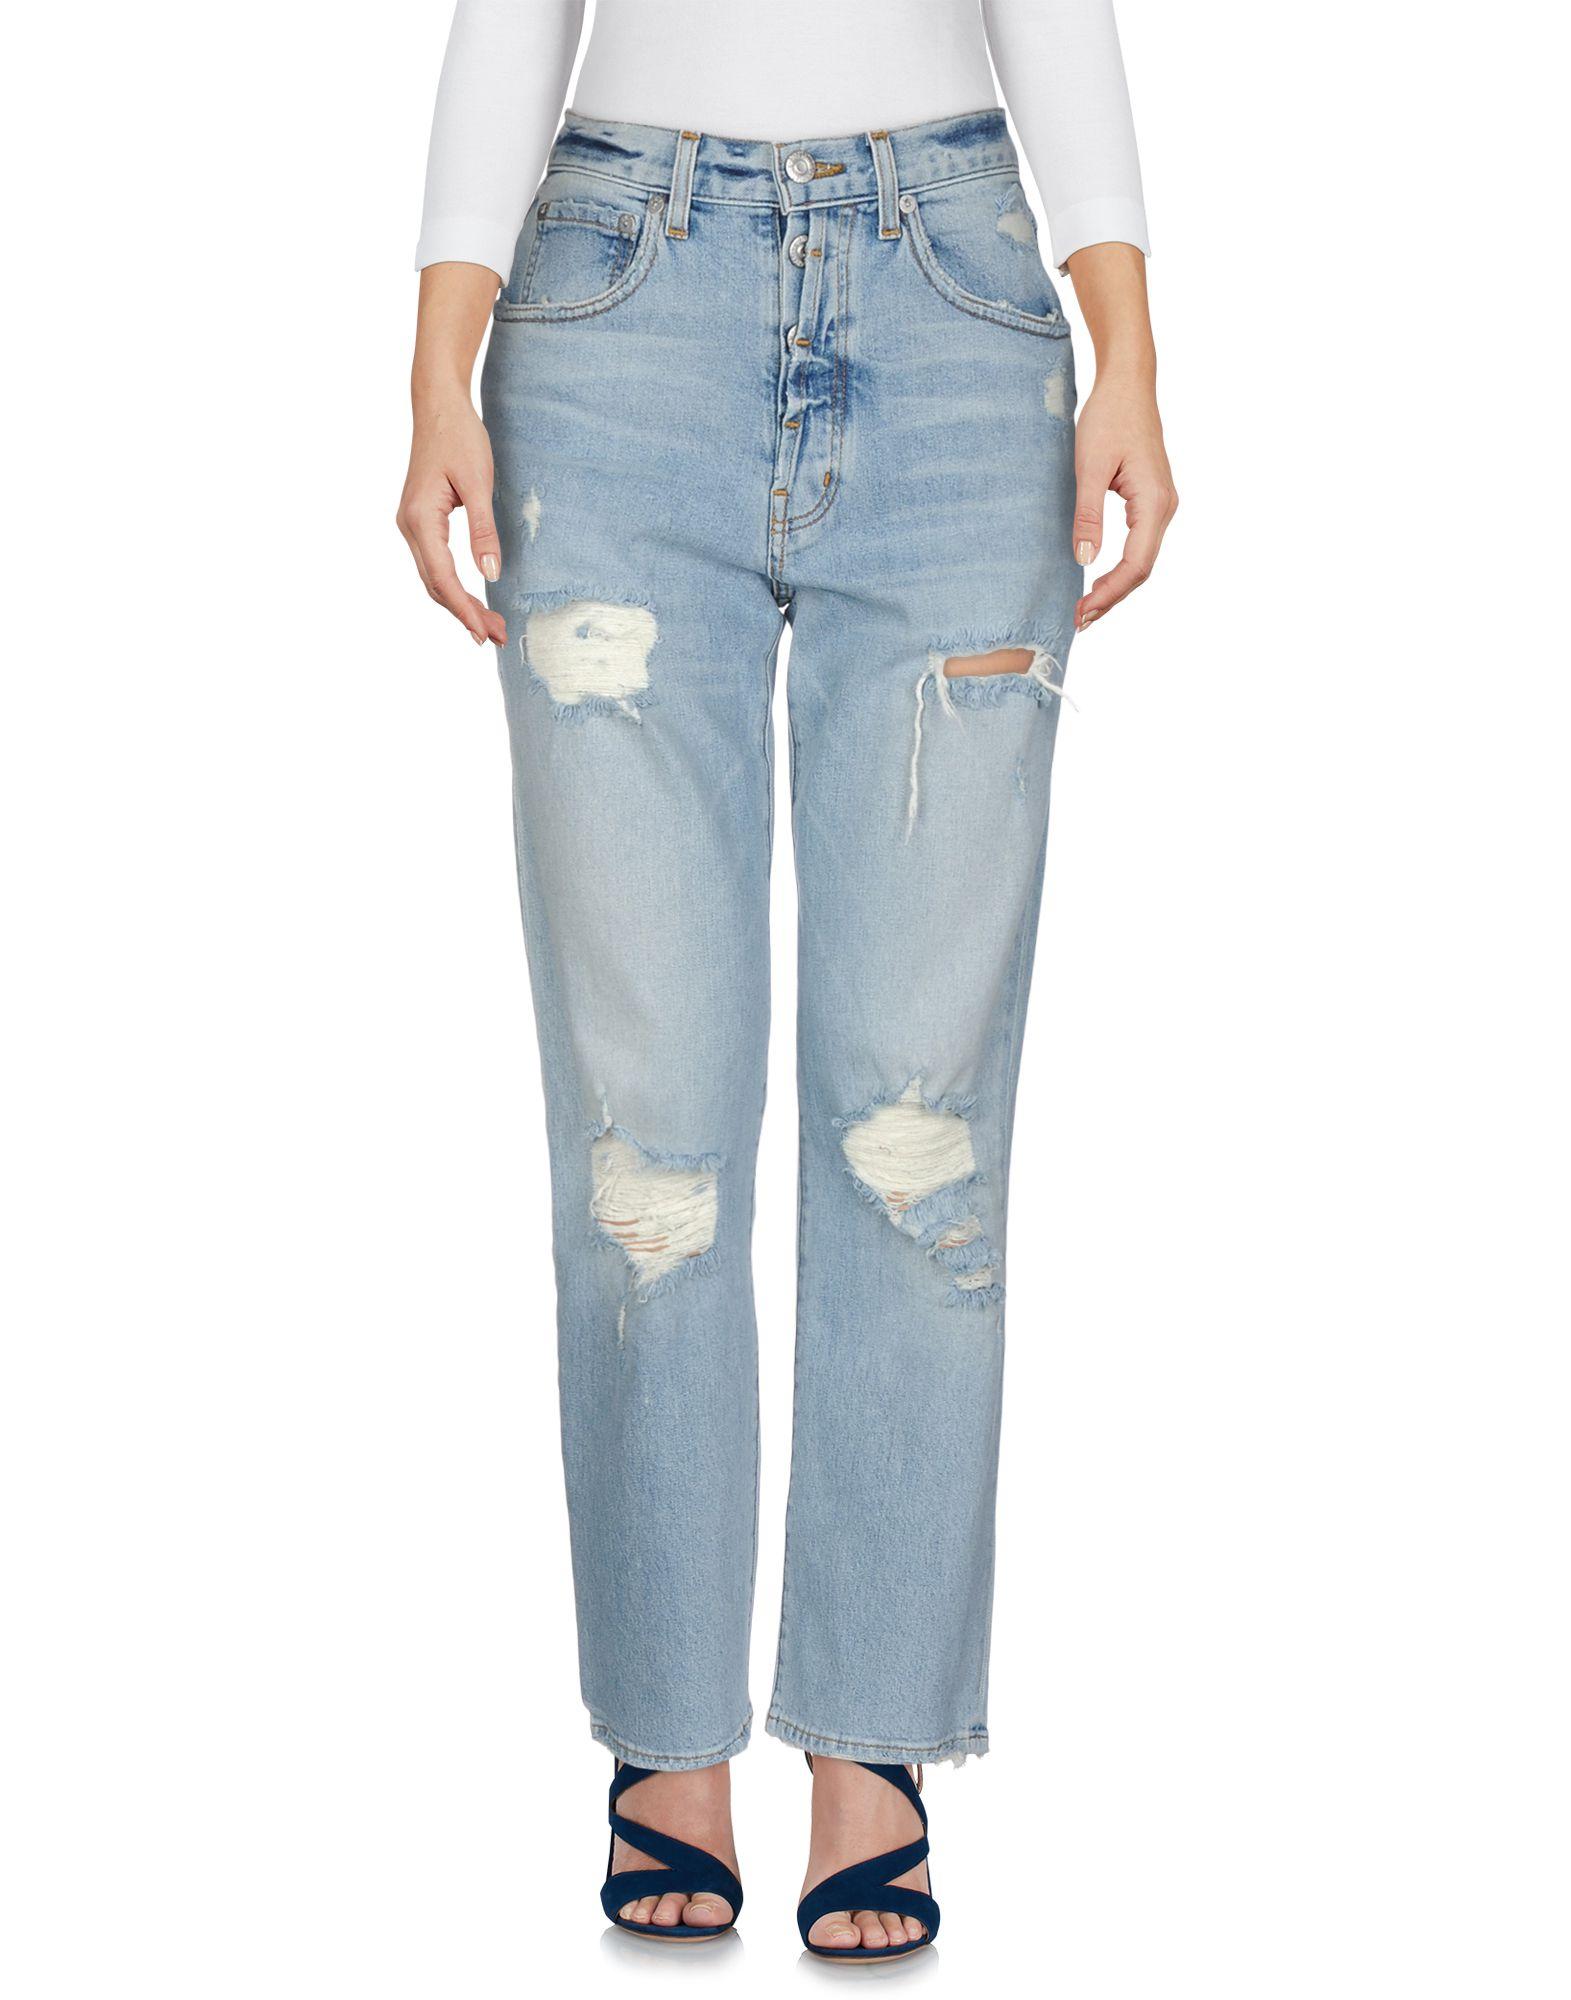 Pantaloni Jeans Adaptation Donna - Acquista online su jDQKdjJRBo